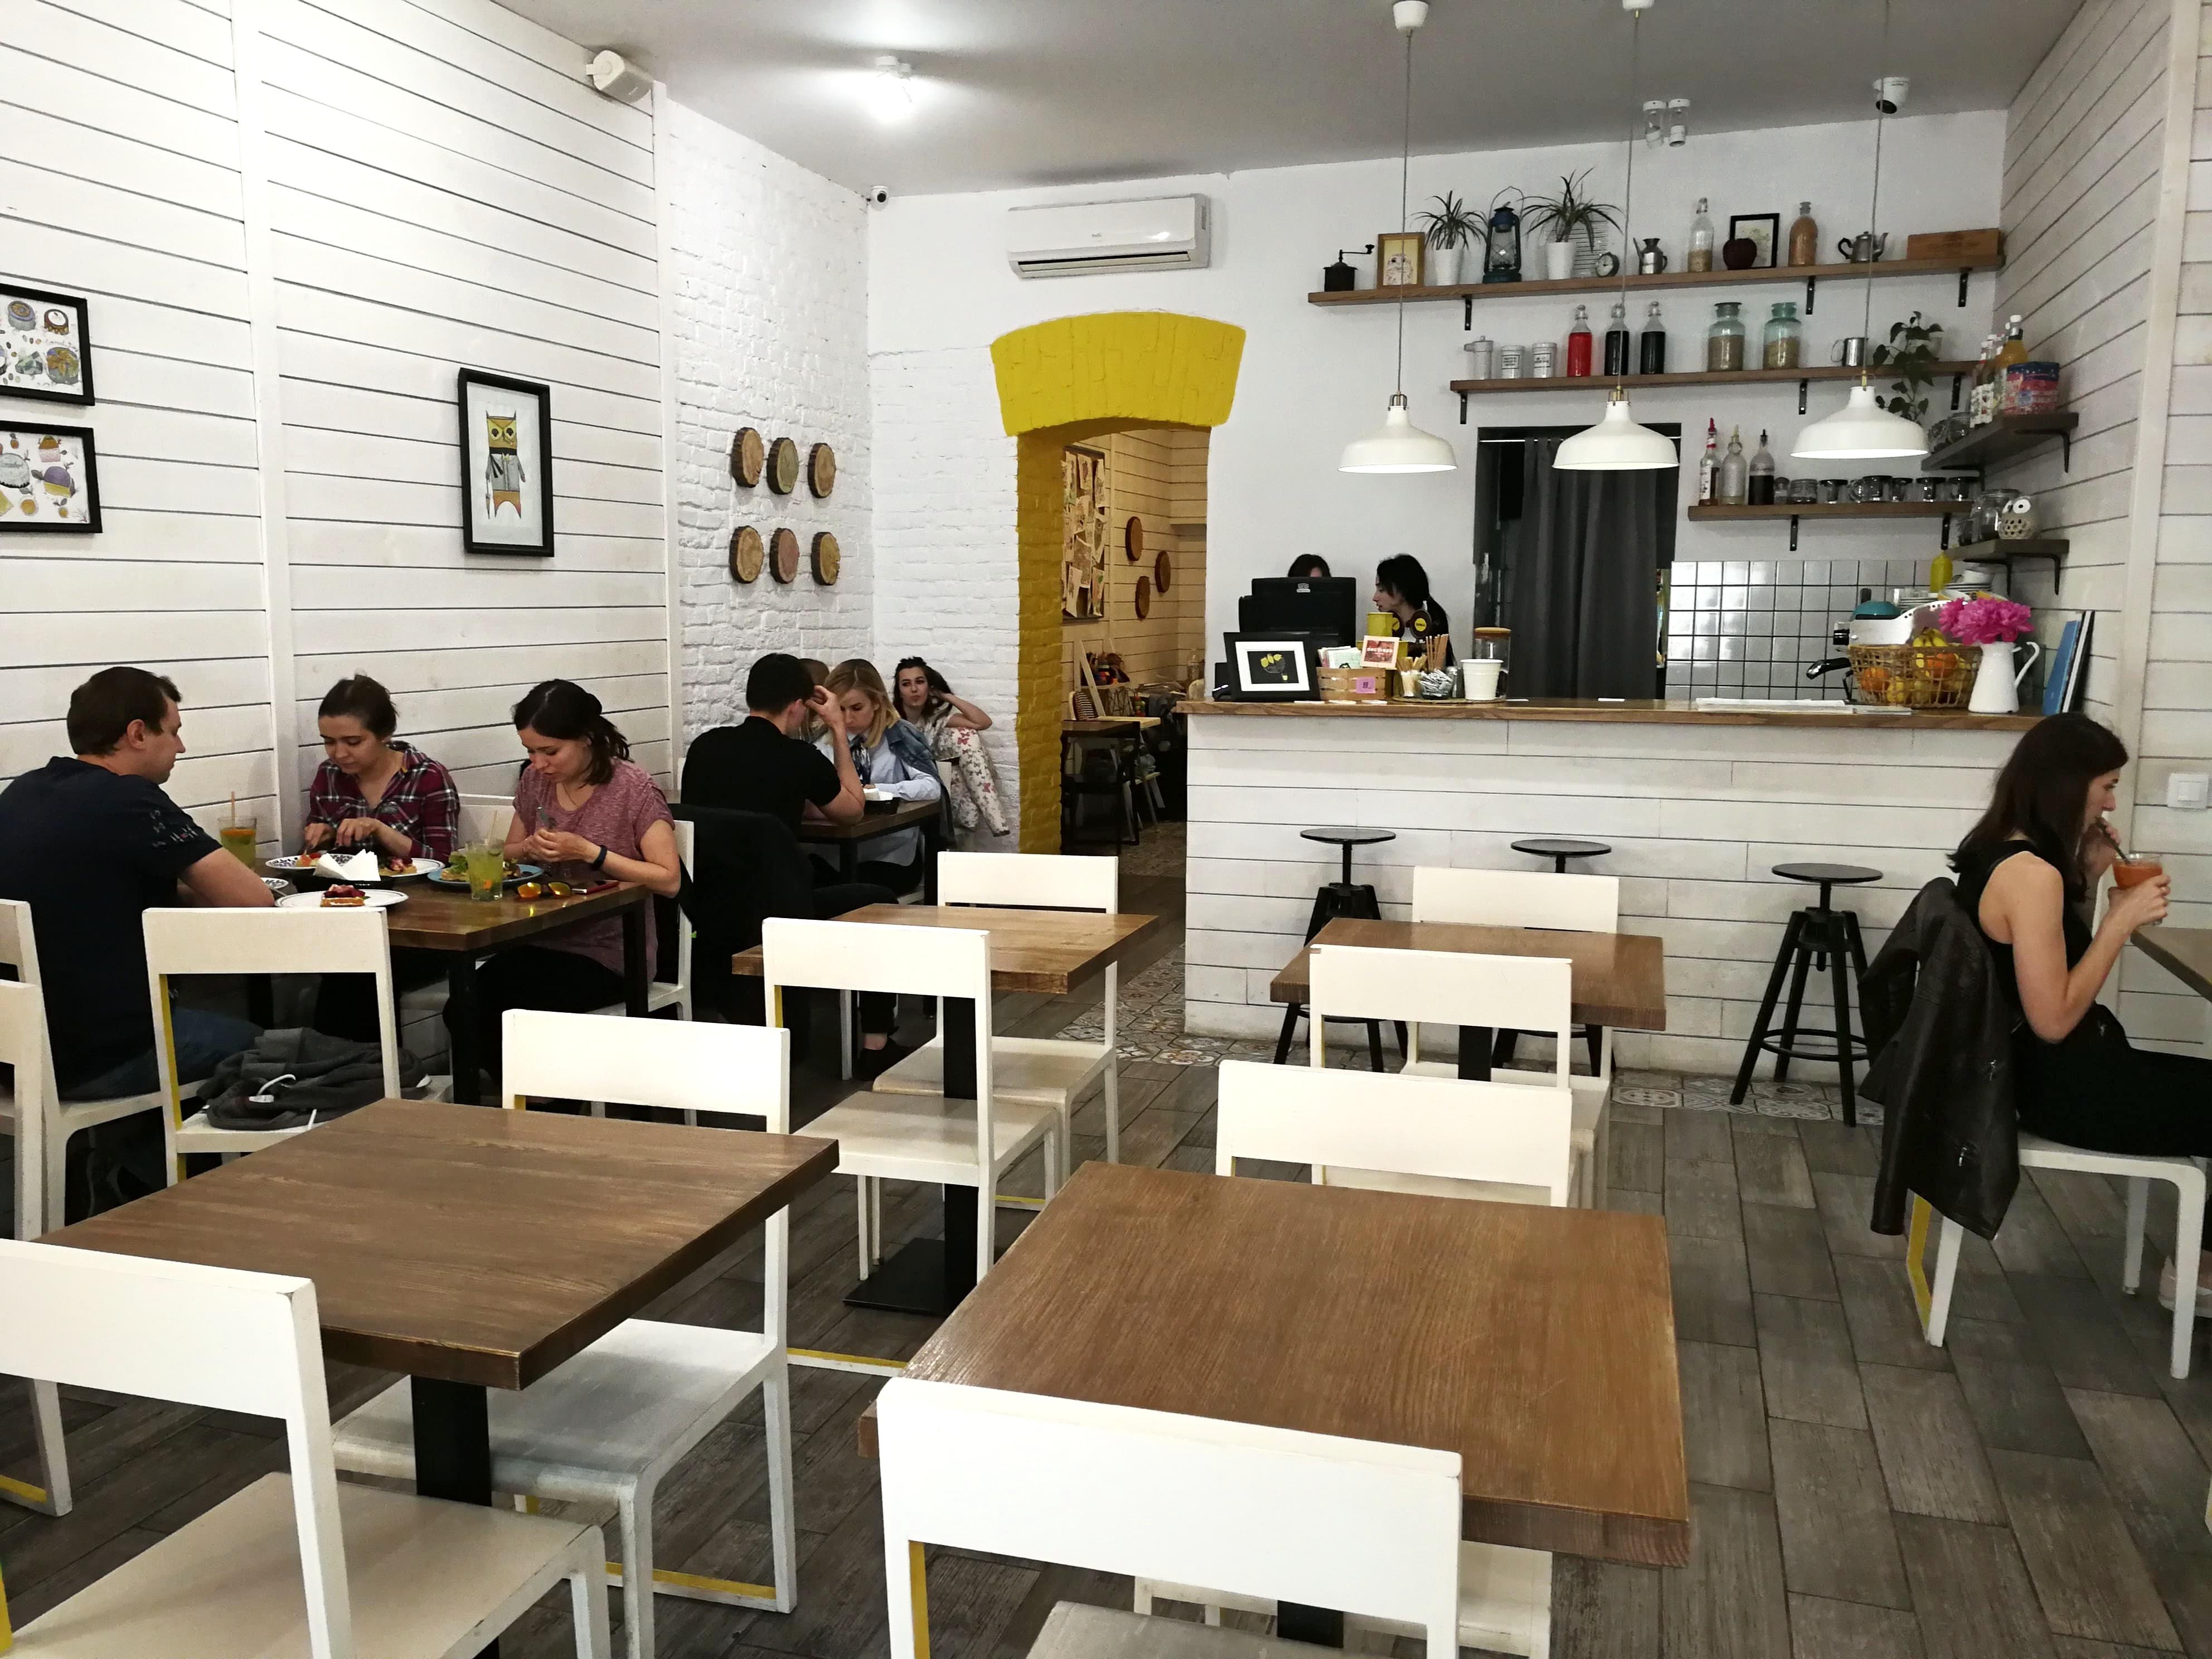 SOWA cafe in Lviv